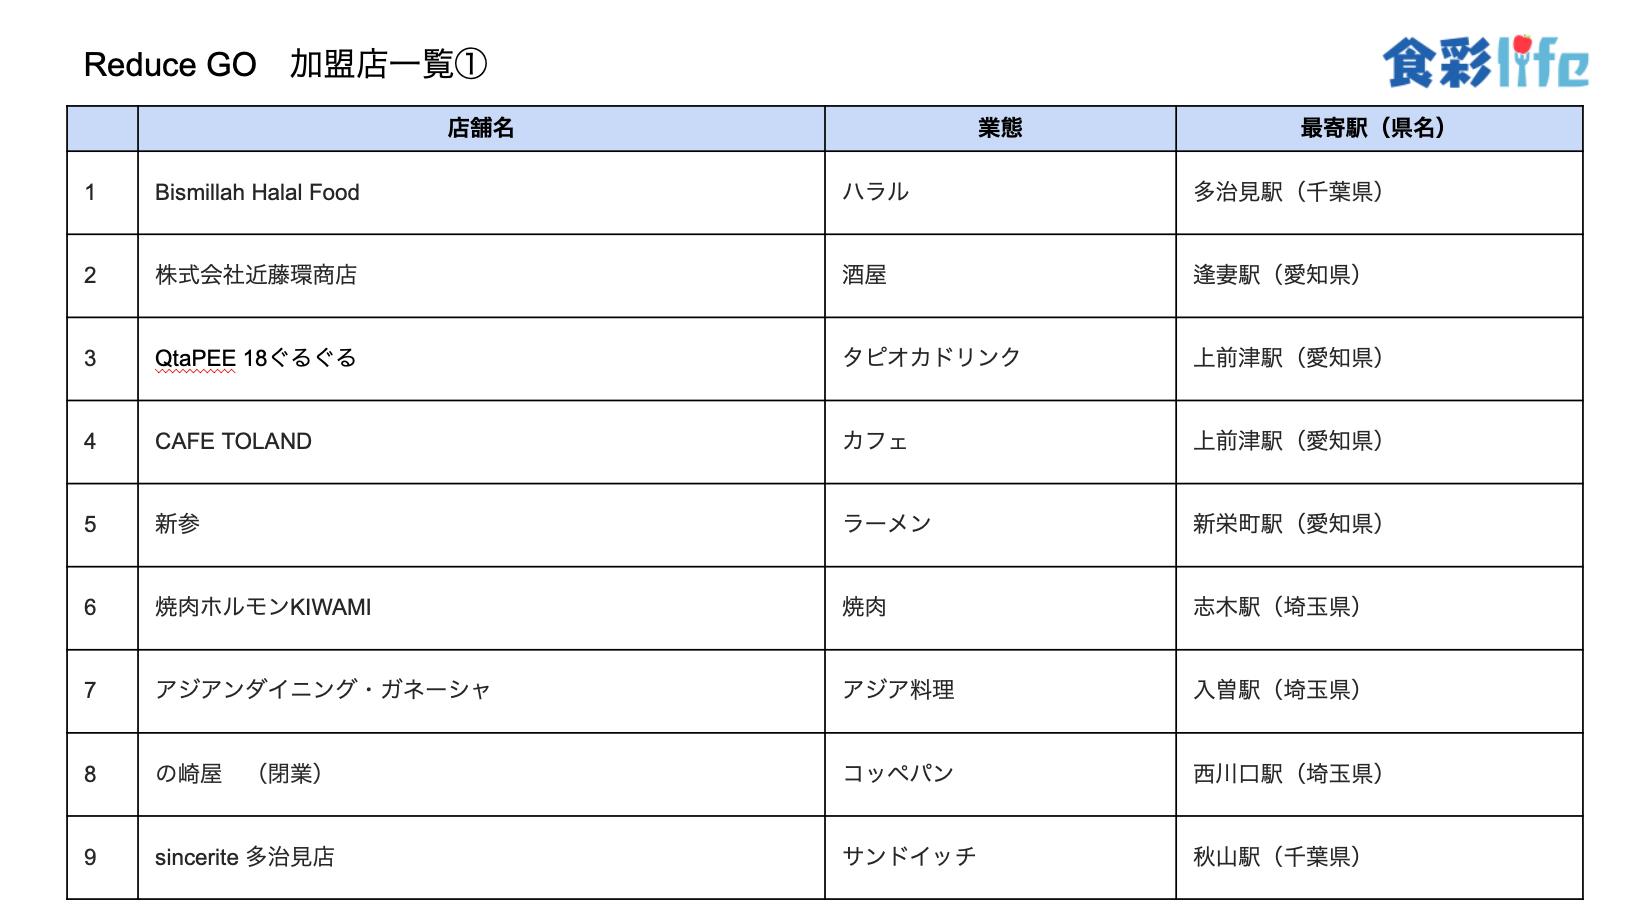 「ReduceGo」加盟店一覧1 (2020.3.18)